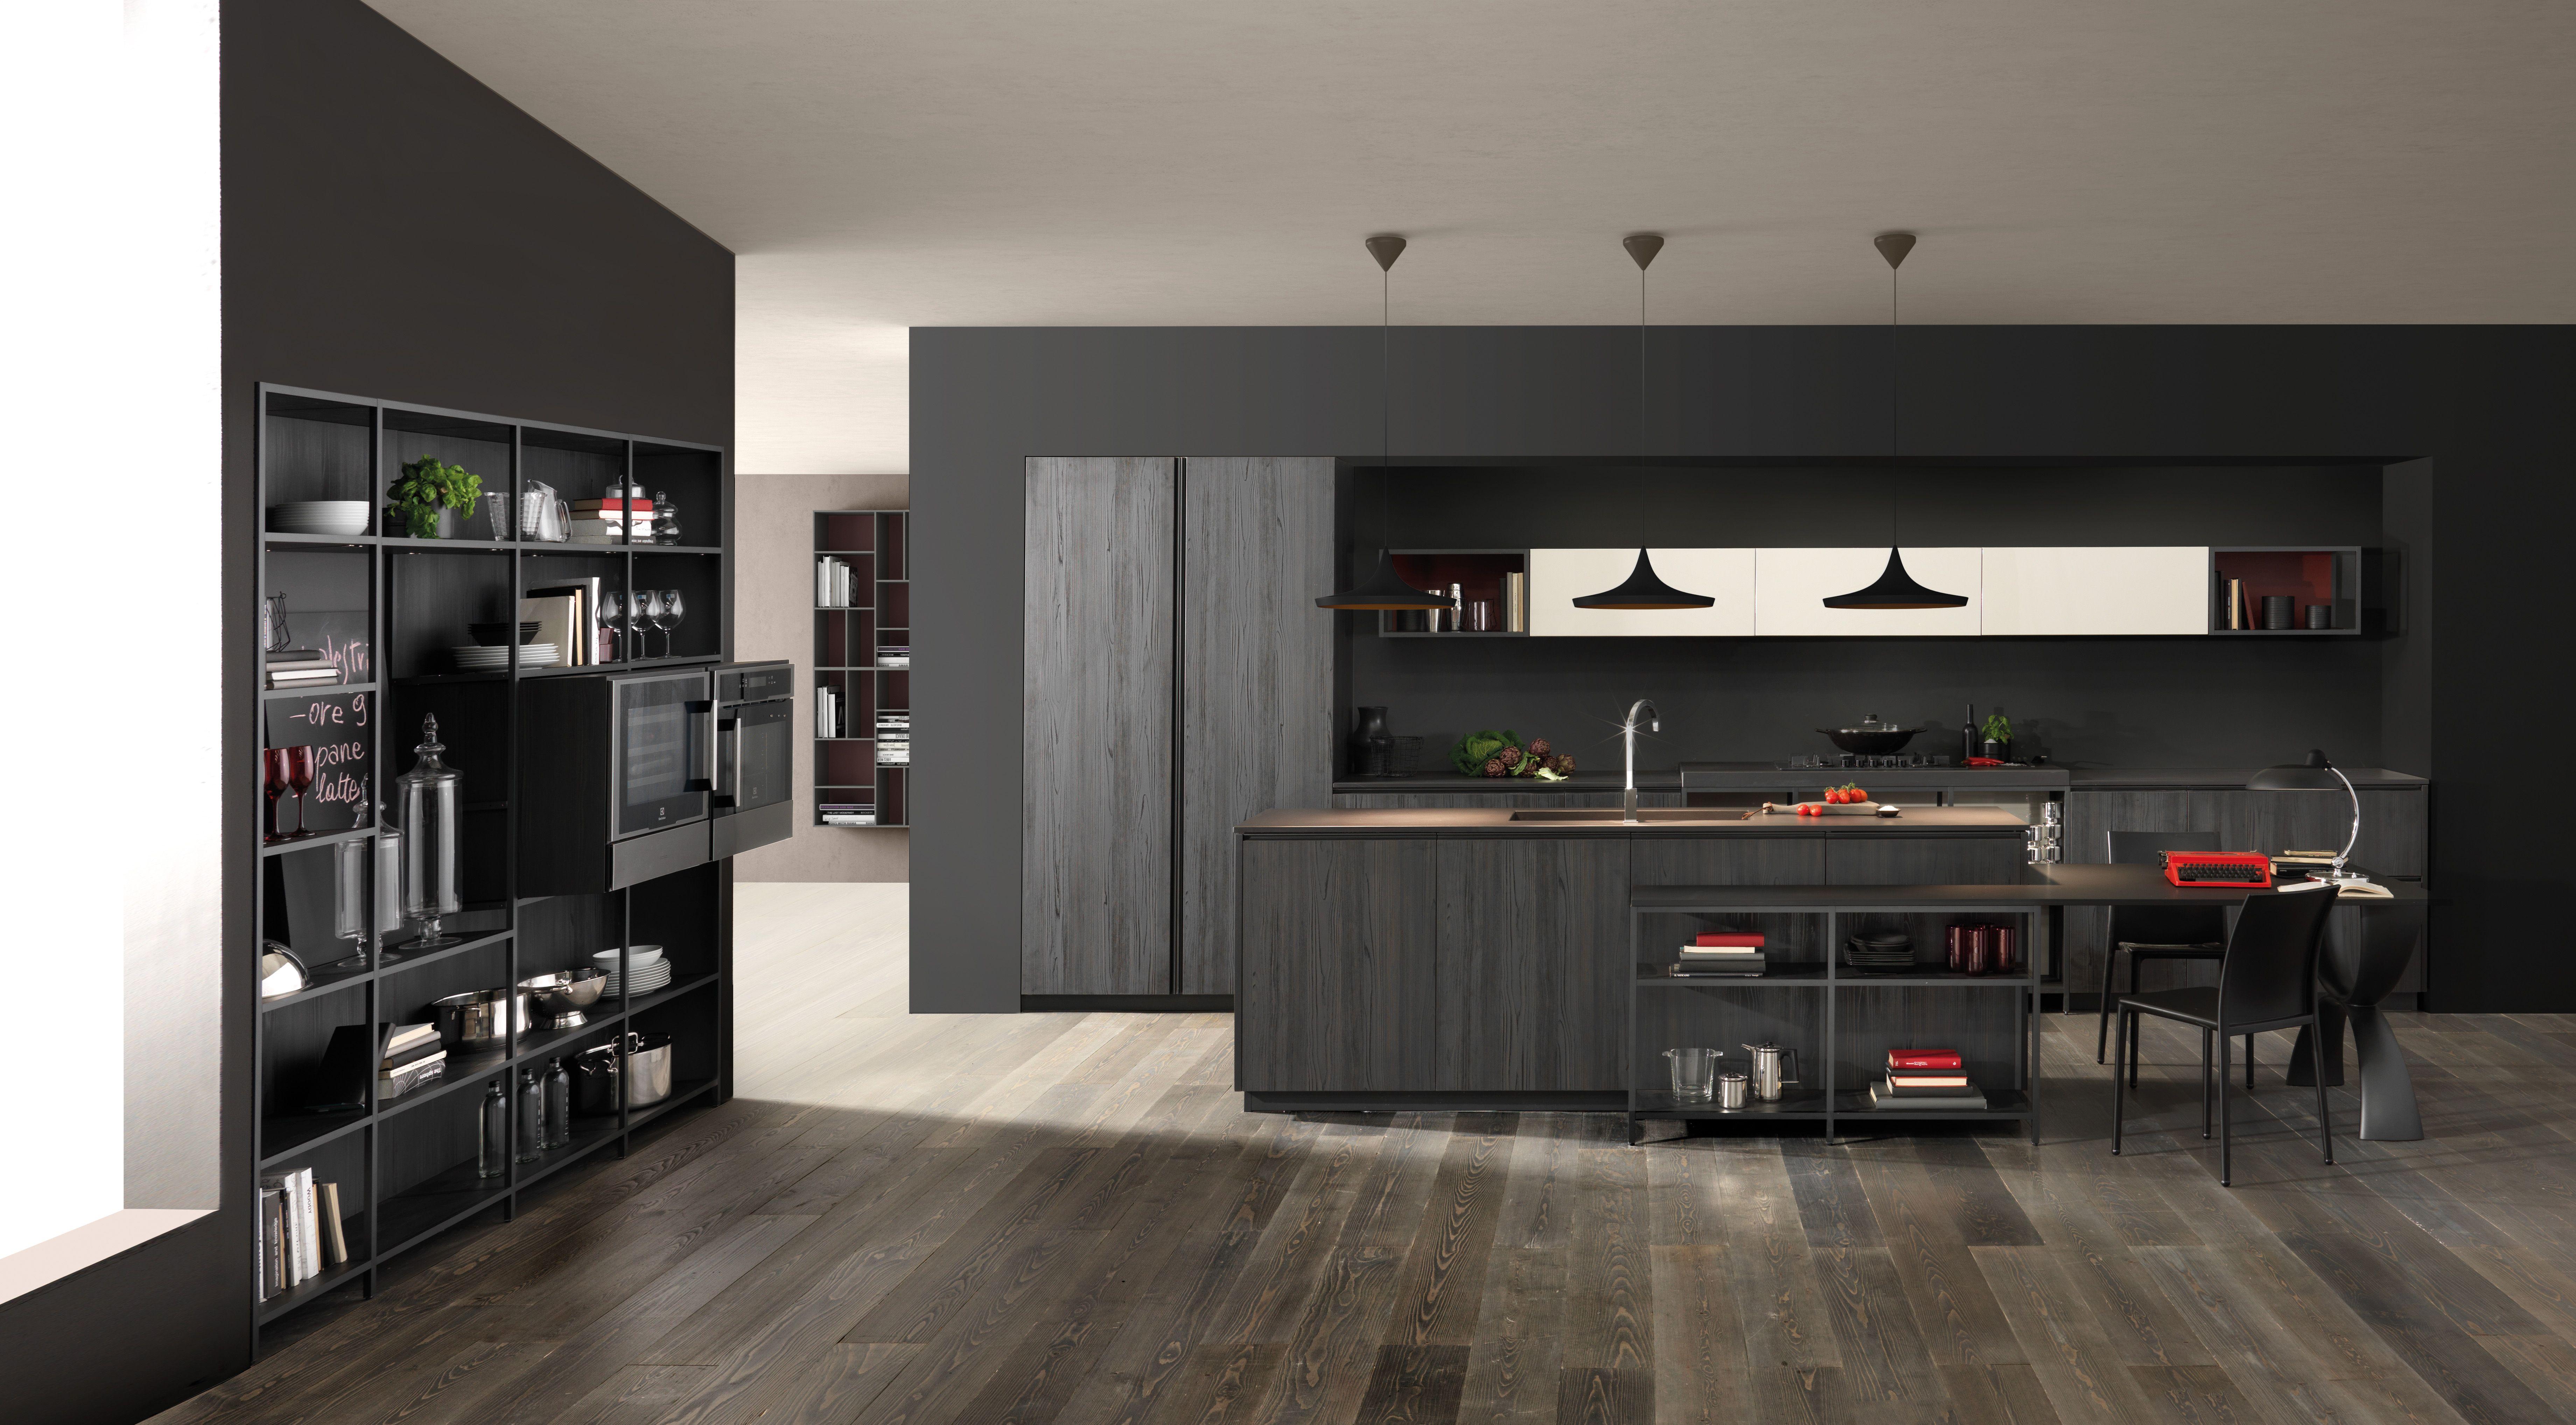 Berloni Küchen ~ Bvolume kitchen loft by berloni. nobilitato sandy creta app thin